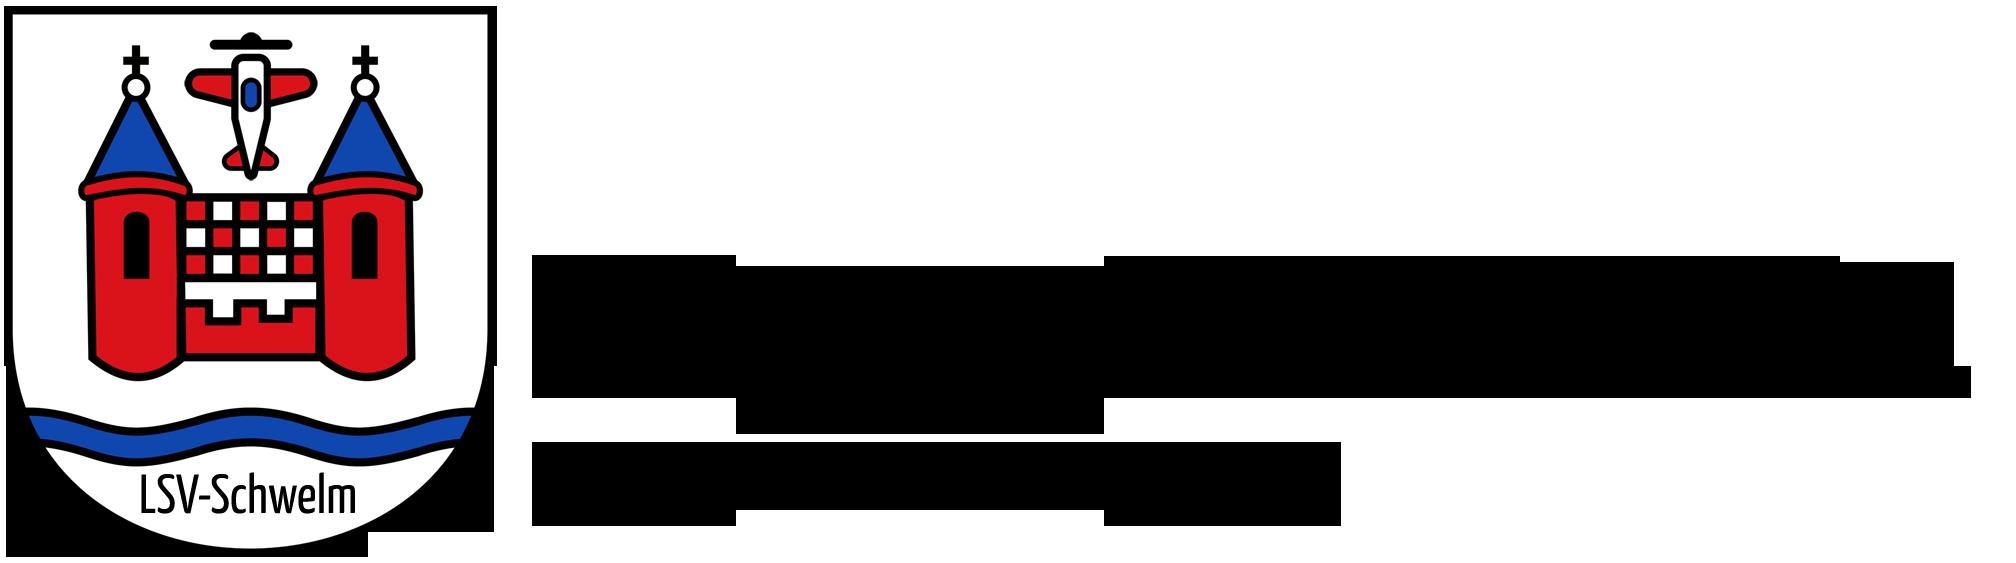 LSV-Schwelm e.V.